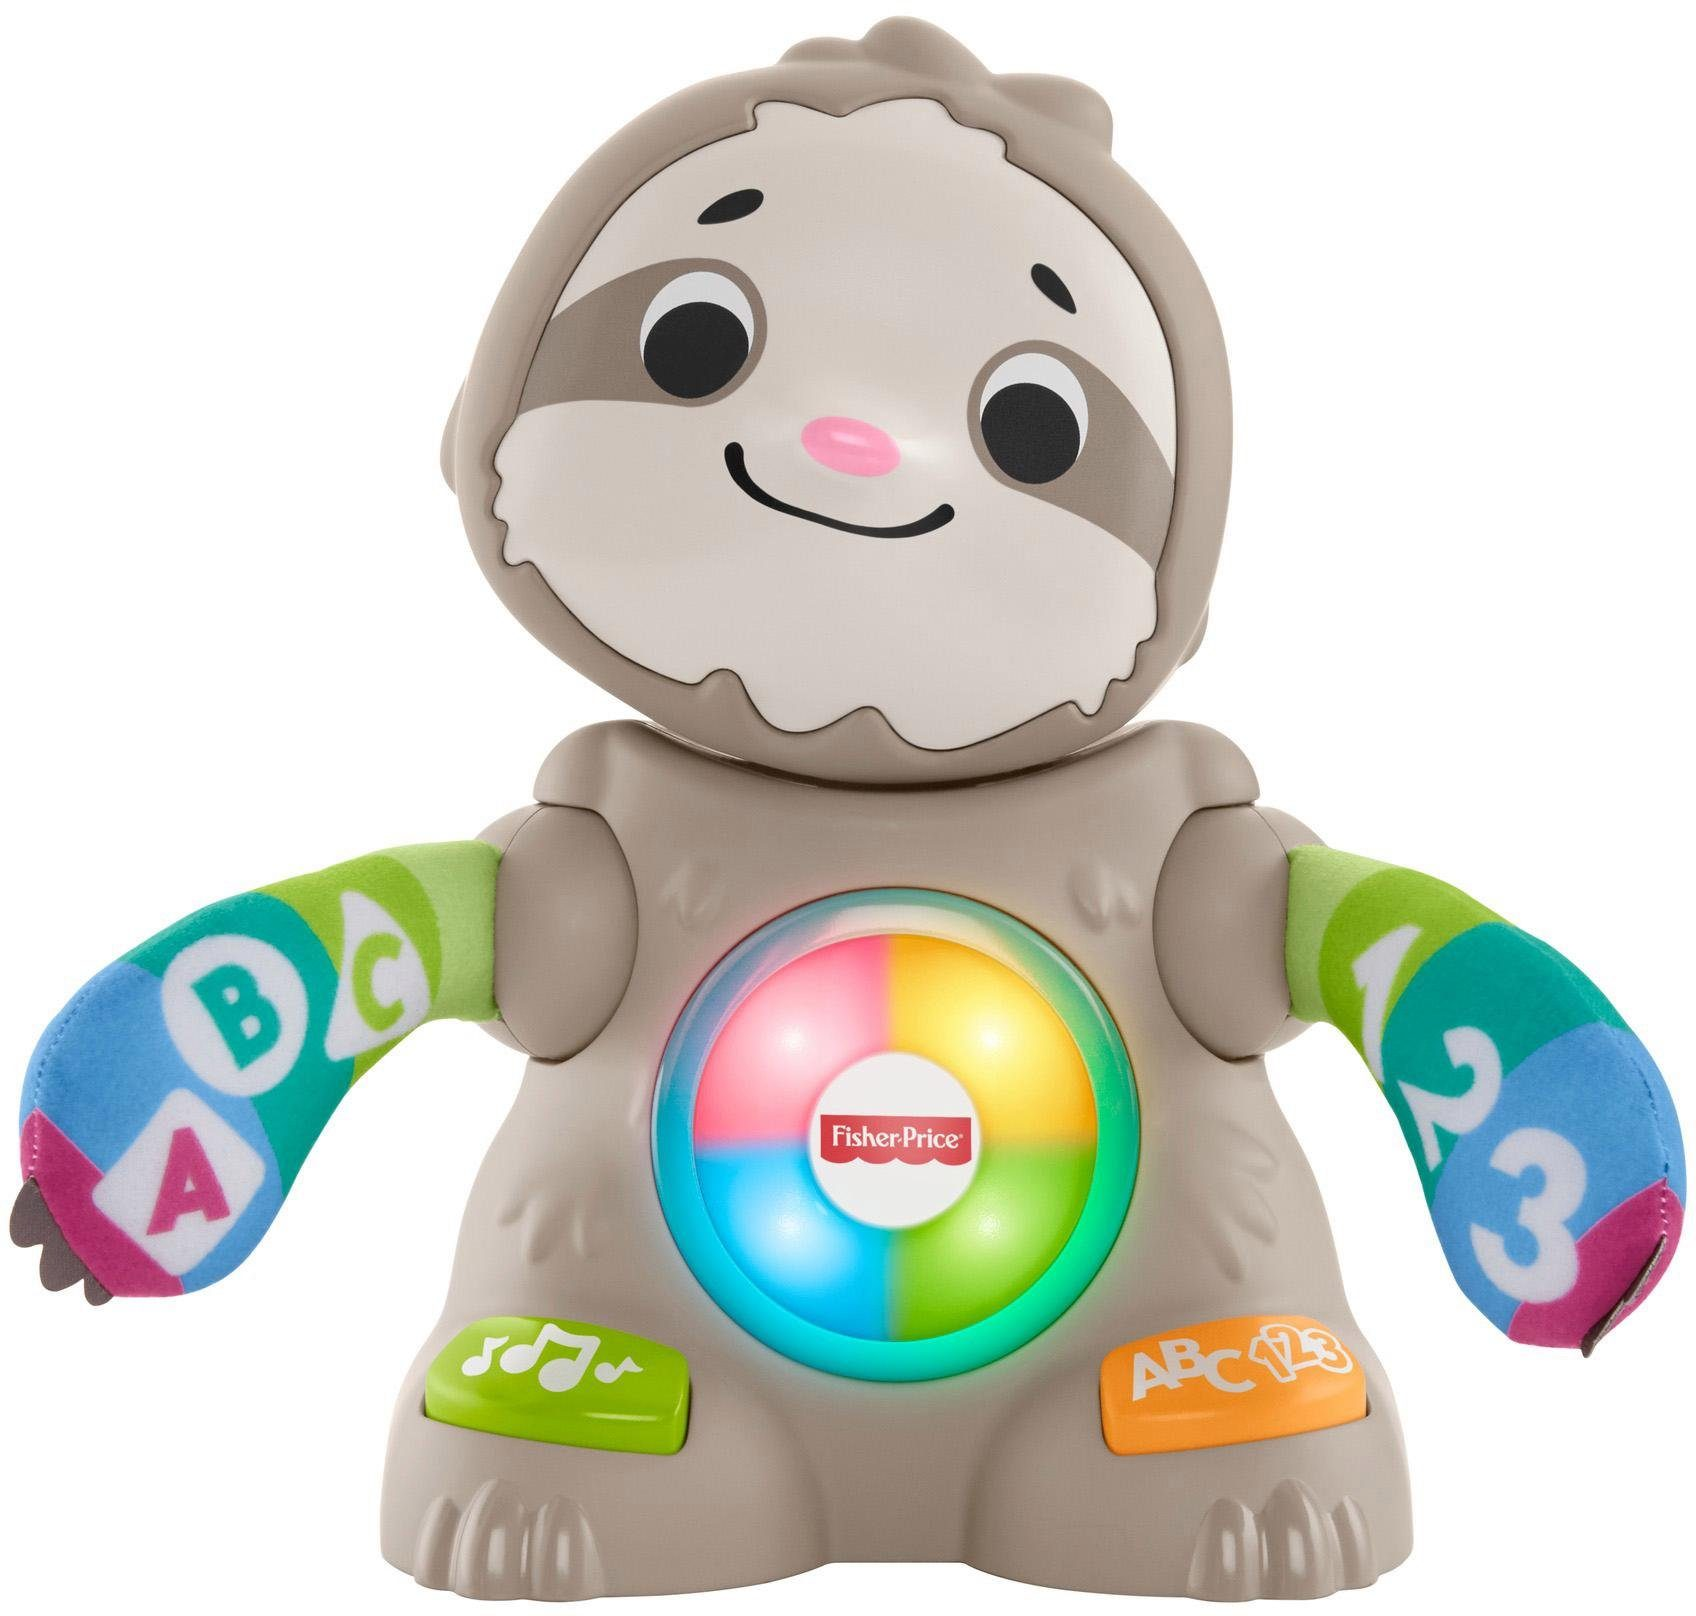 Fisher-Price Lernspielzeug BlinkiLinkis Faultier Technik & Freizeit/Spielzeug/Lernspielzeug/Lernspiele